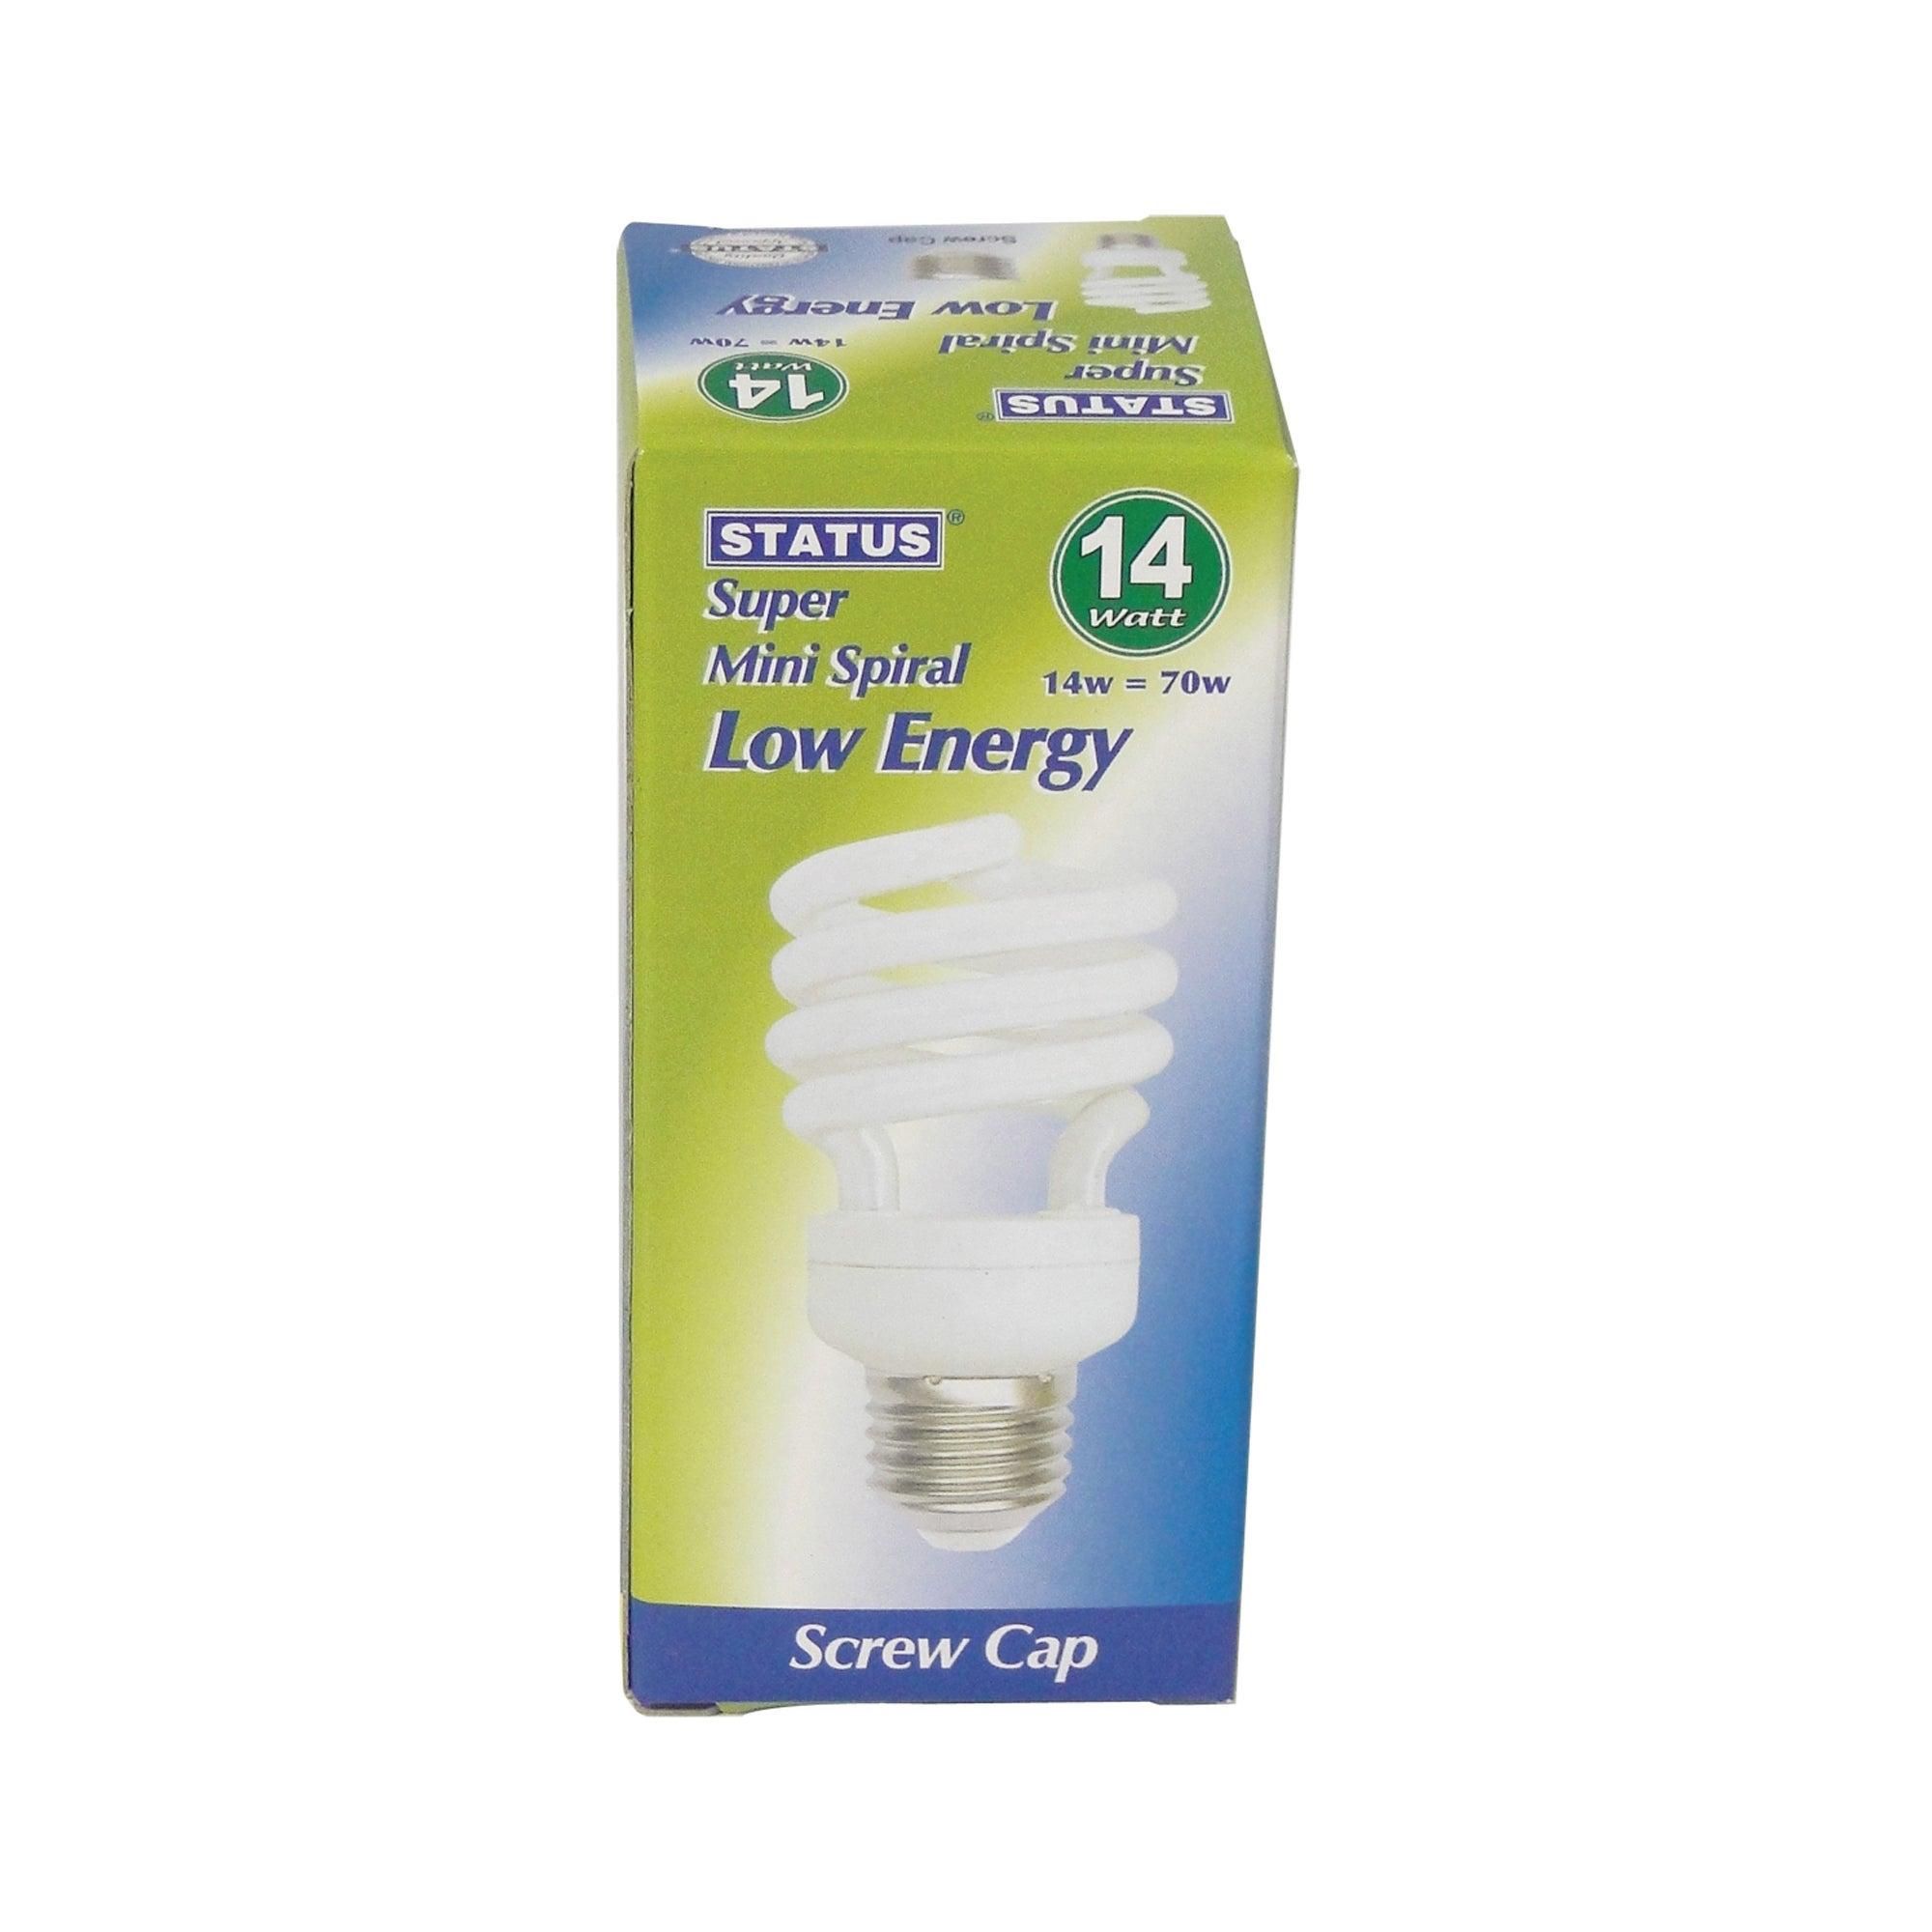 Status Halogen Energy Saver ES 14 Watt Spiral Bulb